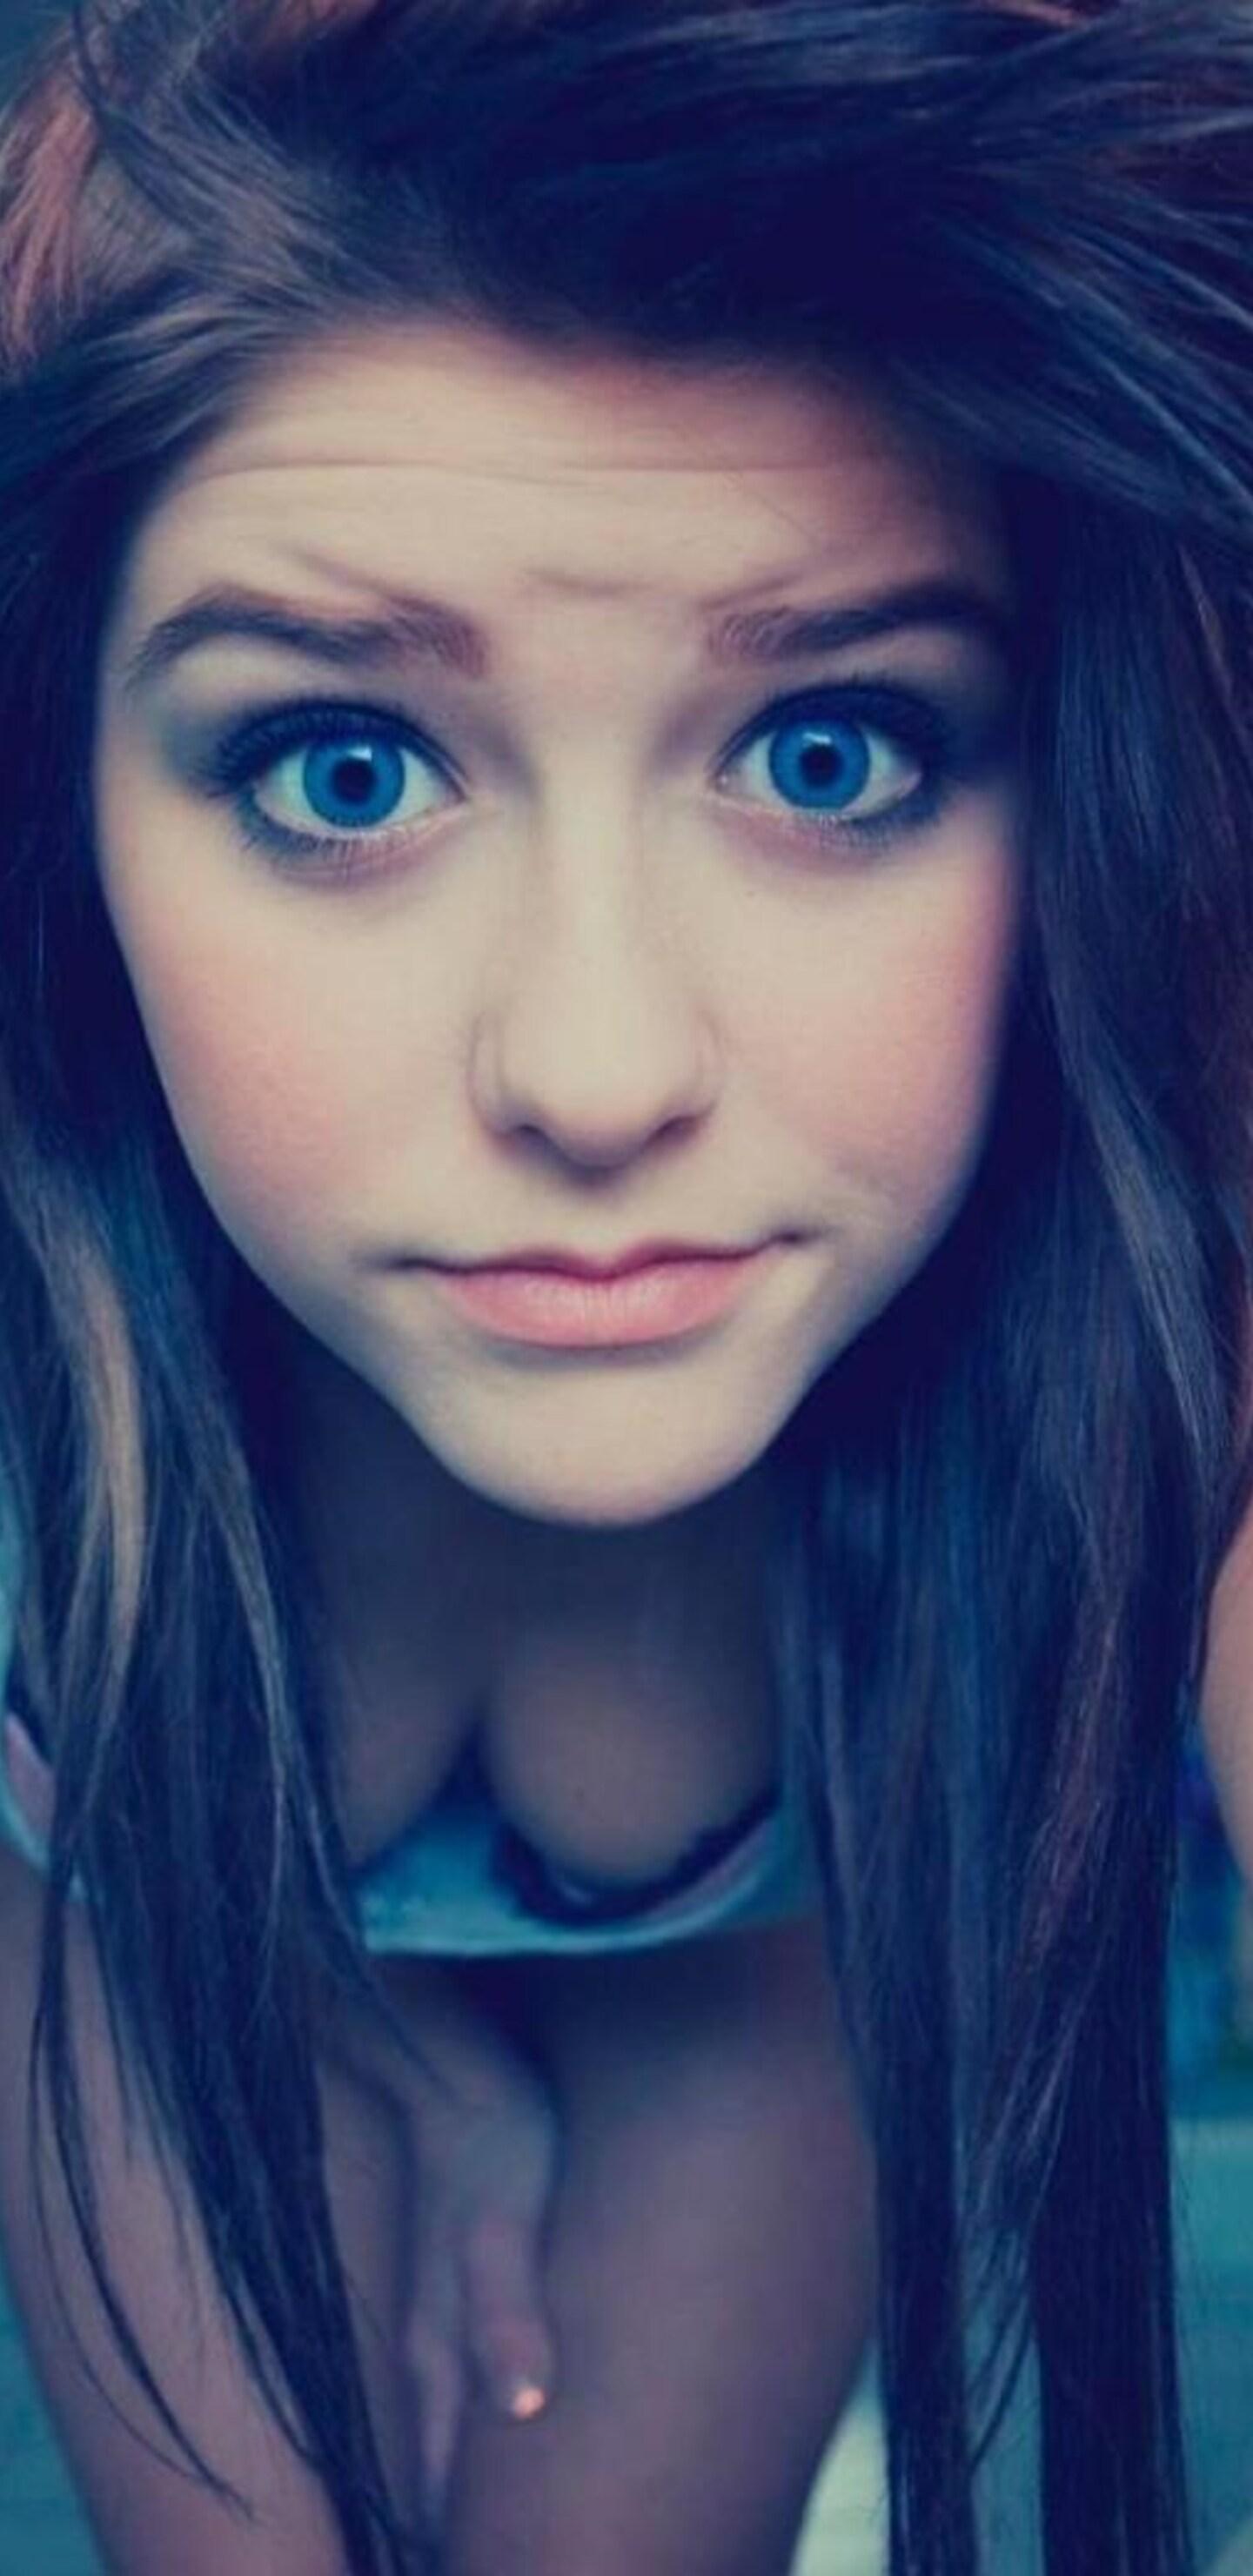 1440x2960 blue eyes cute teen girl samsung galaxy note 9 8 - Galaxy wallpaper for girls ...